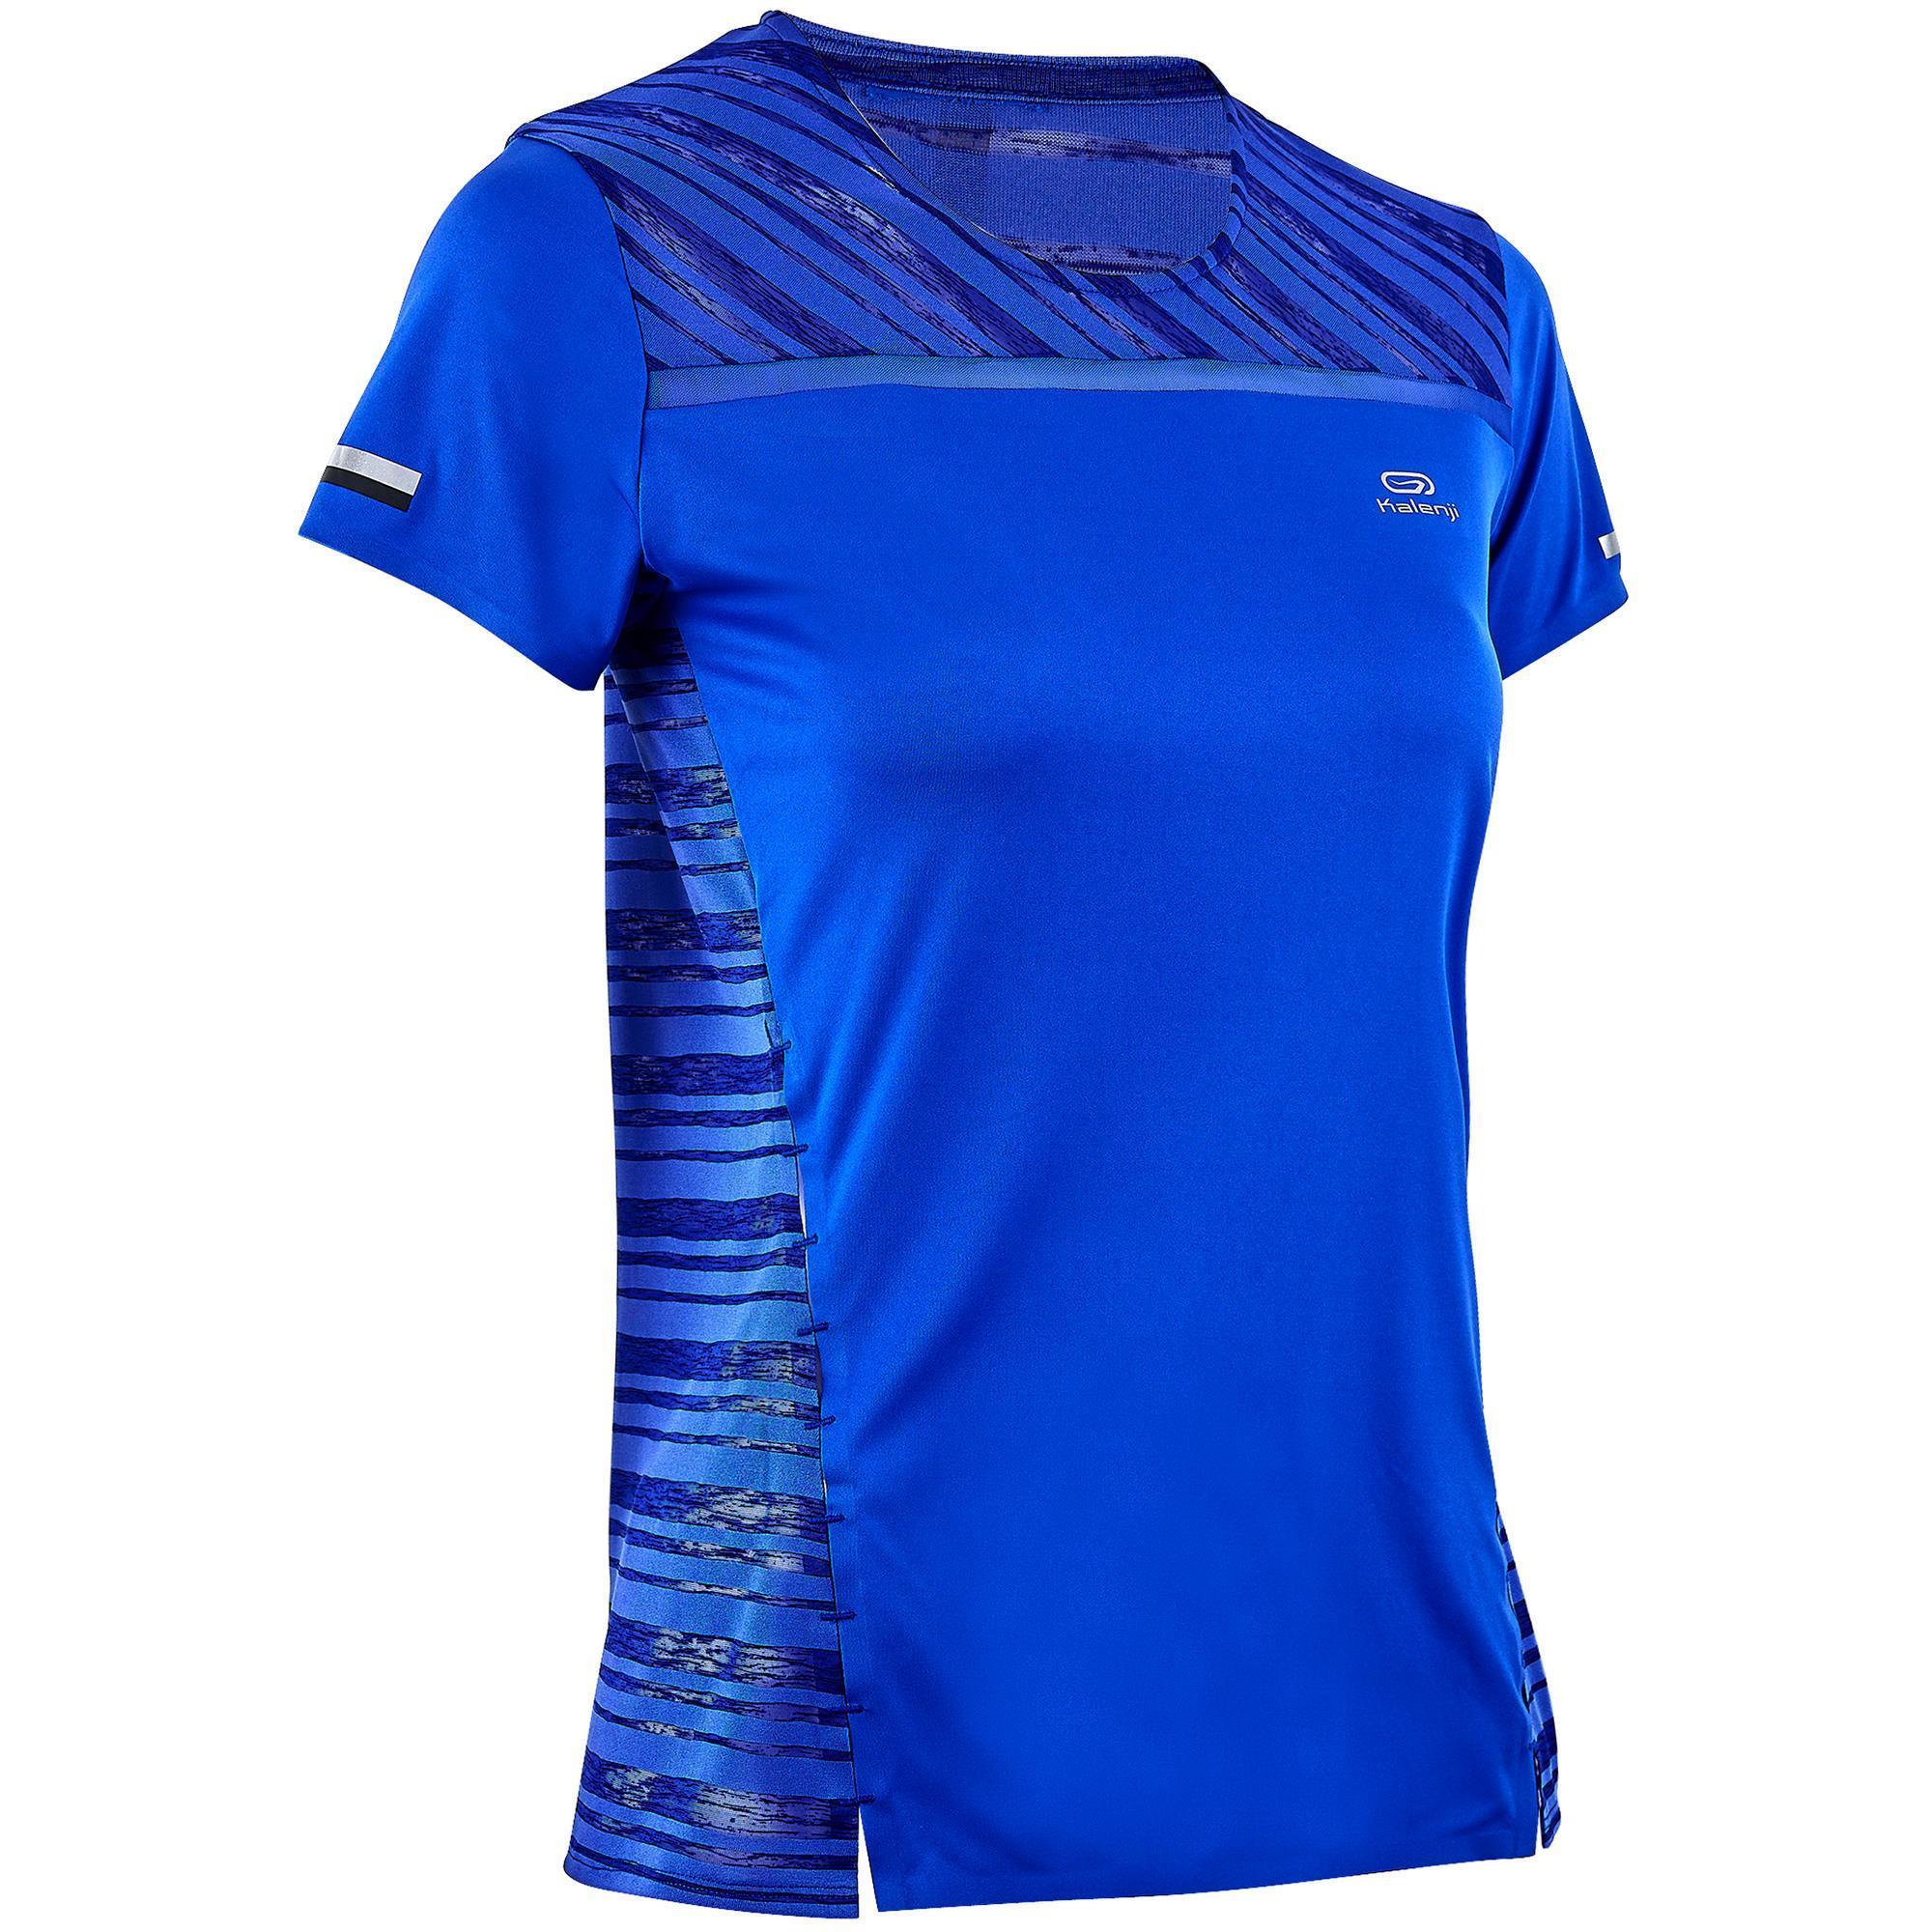 Kalenji Hardloopshirt voor dames Kiprun Light blauw